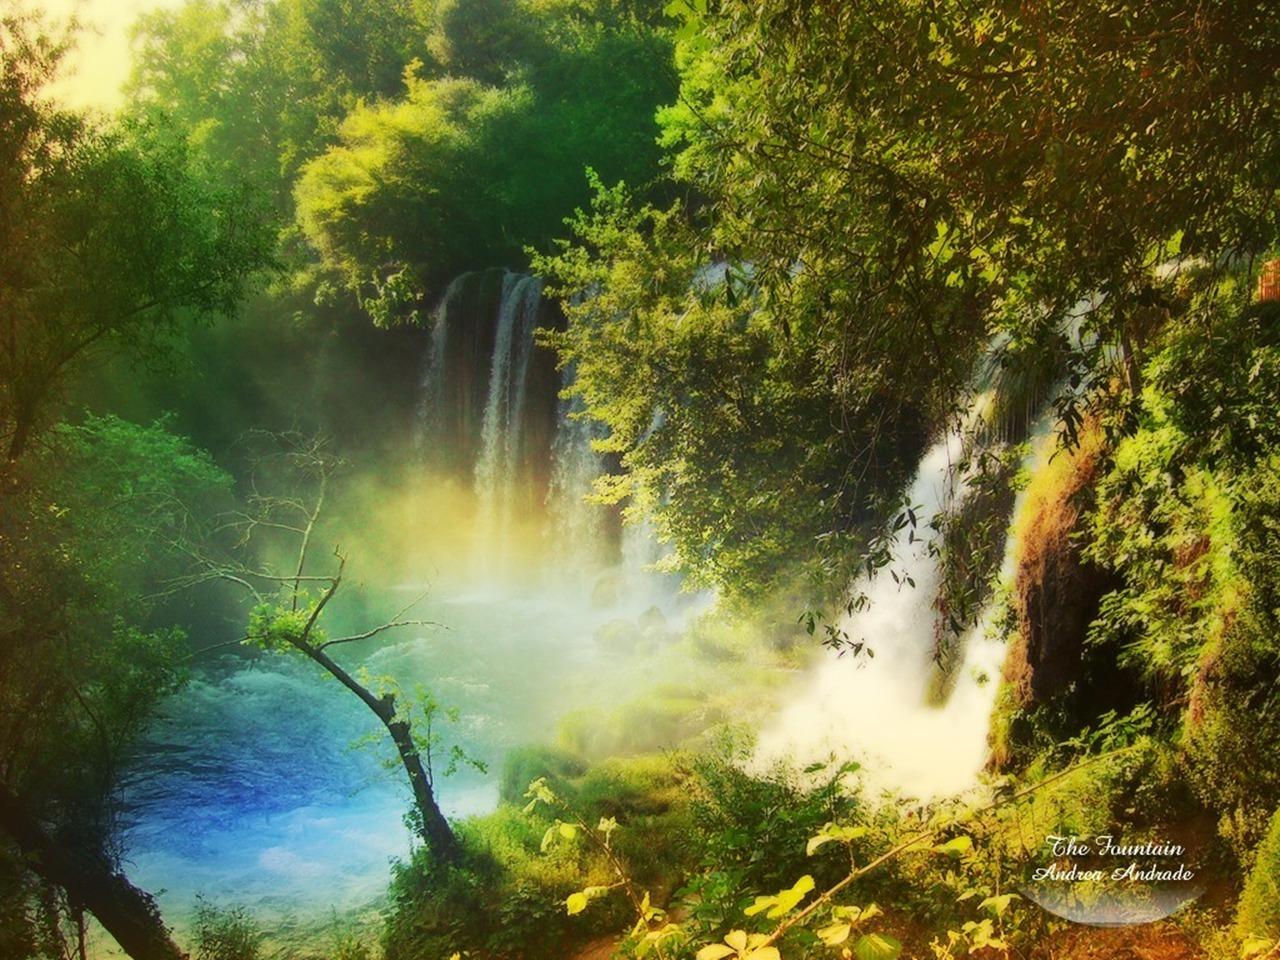 amazon nature wallpaper - photo #8